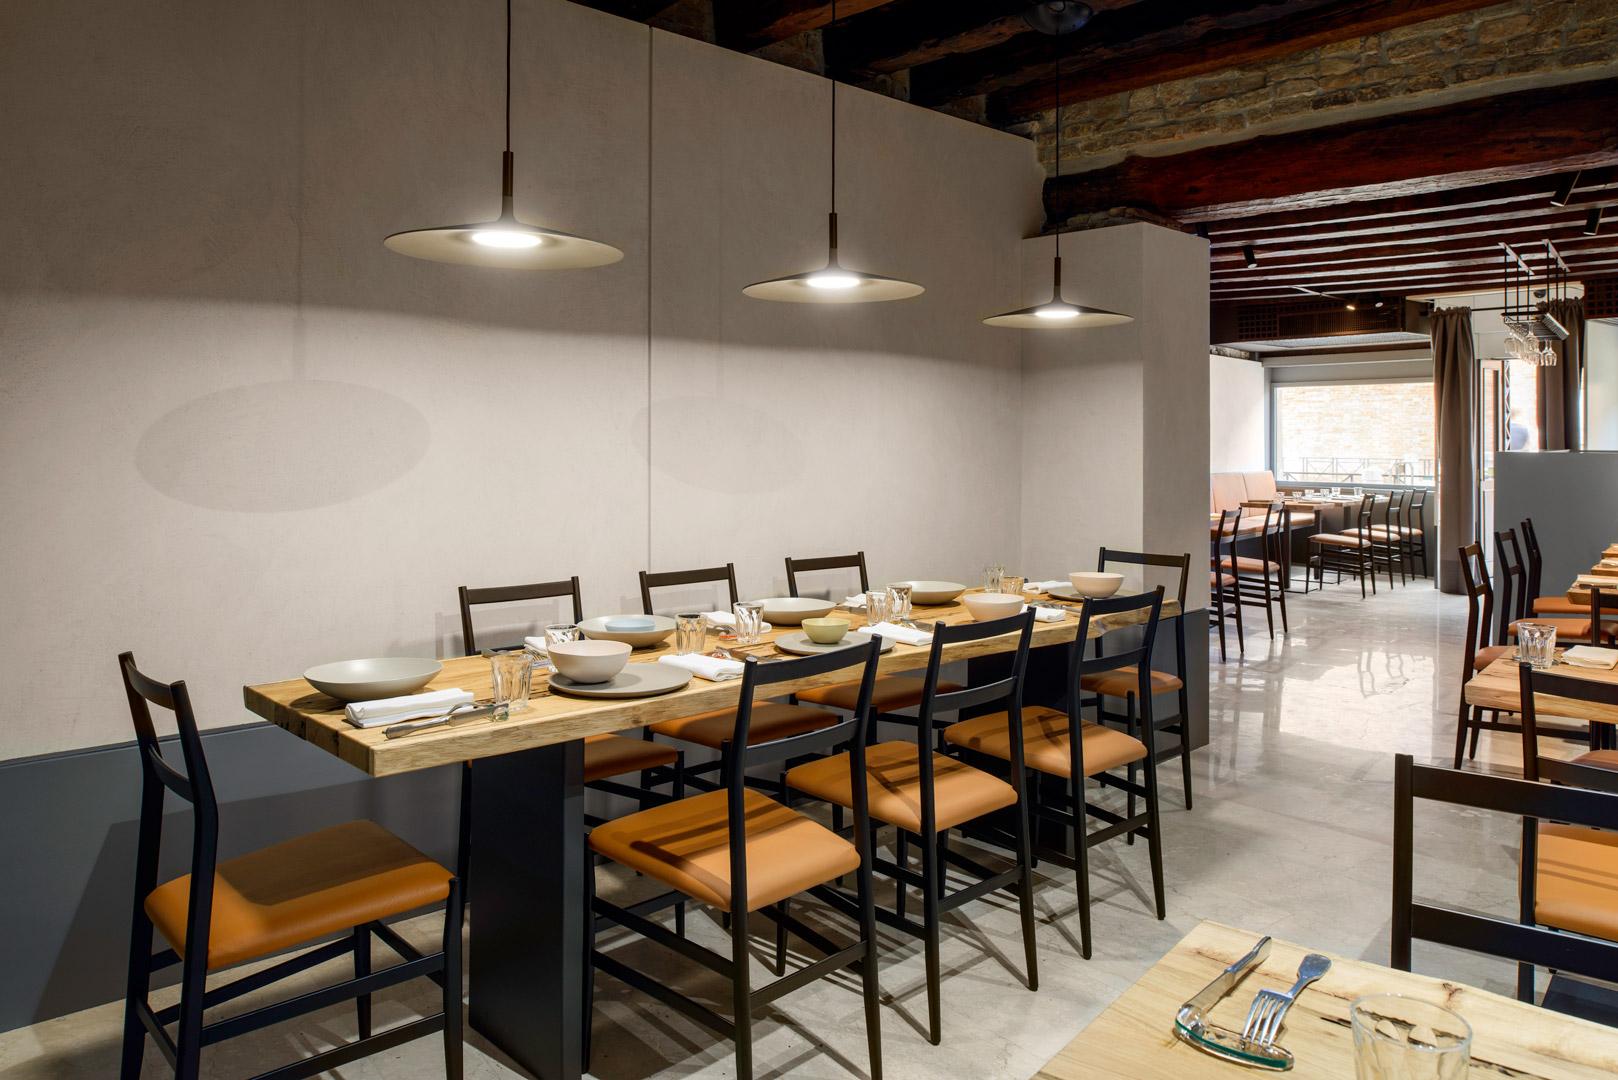 Restaurant Zanze XVI Featuring Aplomb -